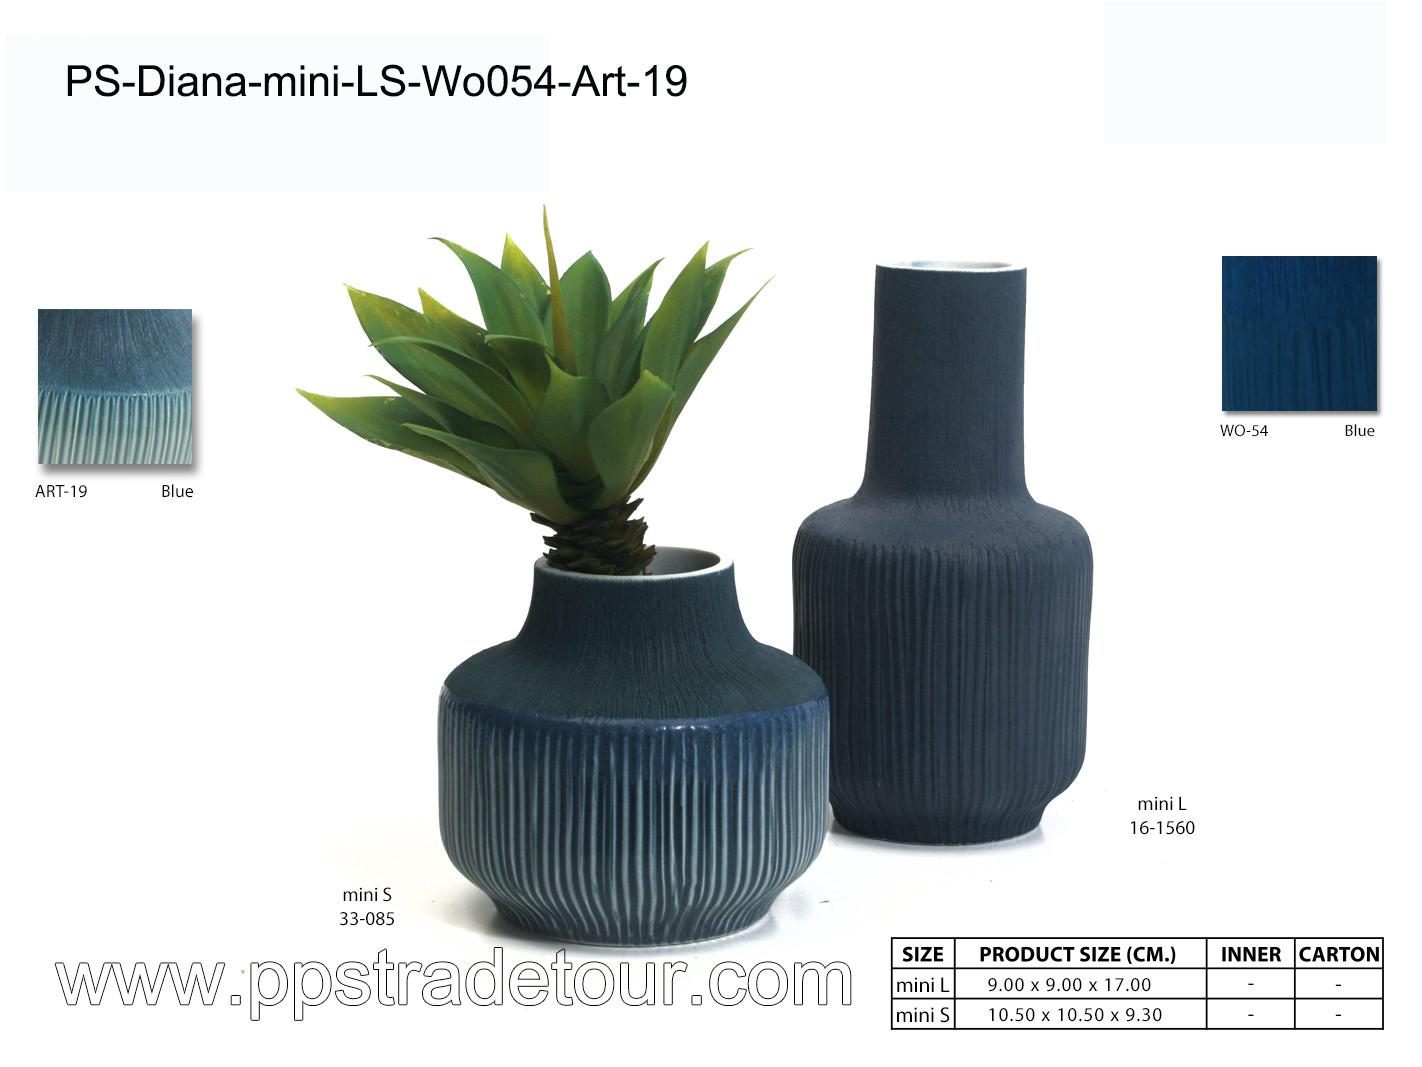 PSCV-Diana-mini-LS-WO-54-ART-19